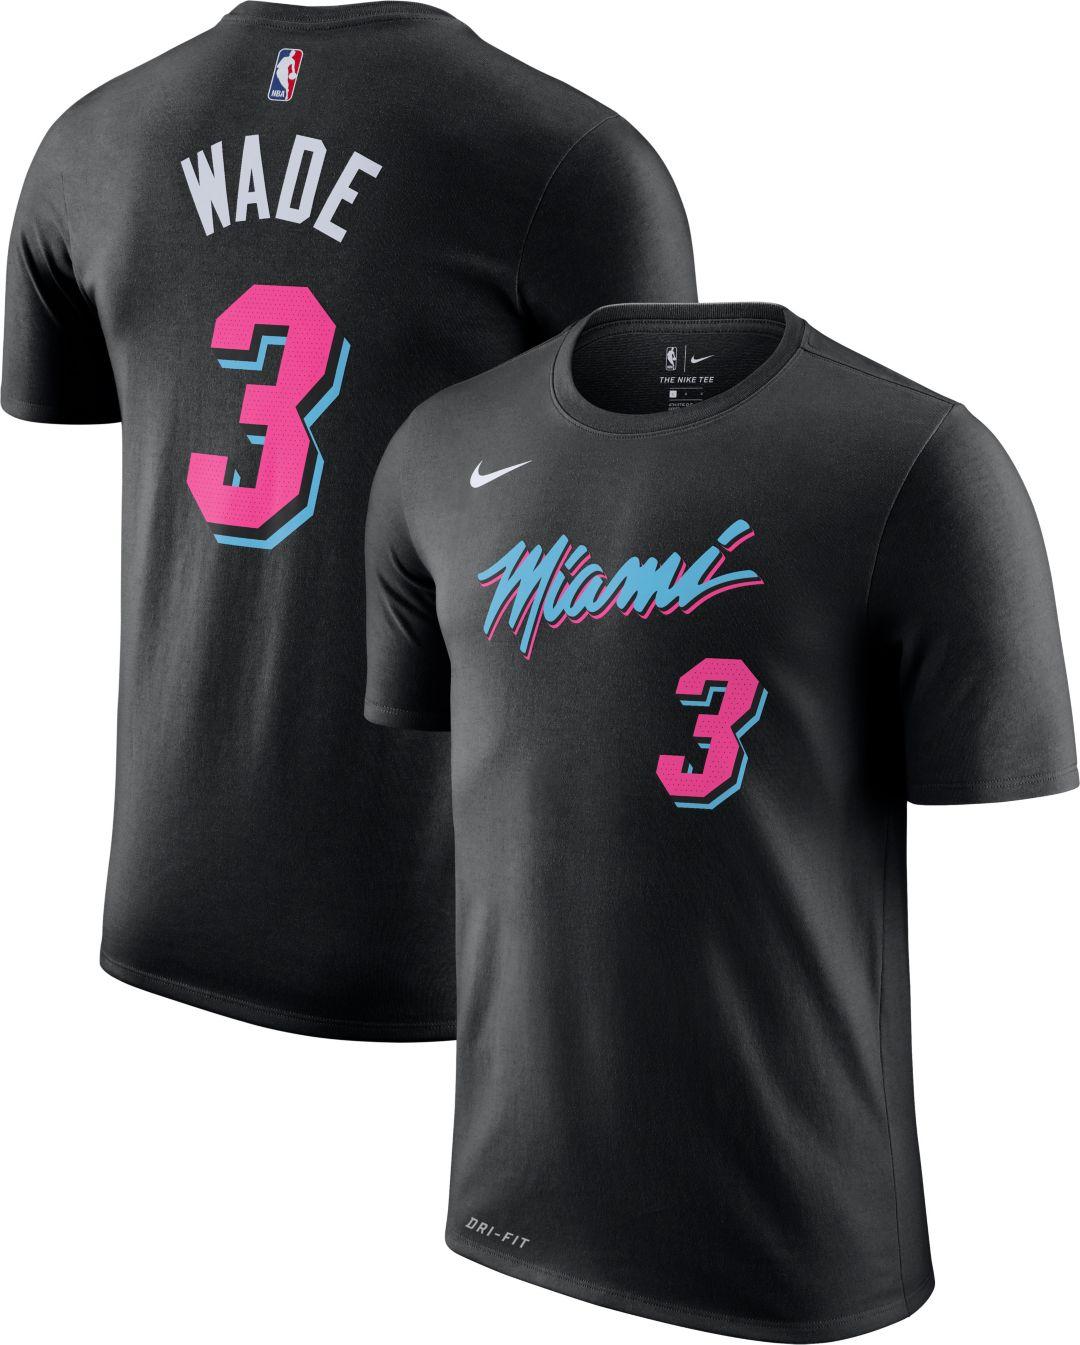 lowest price 0e90f 987e5 Nike Men's Miami Heat Dwyane Wade Dri-FIT City Edition T-Shirt